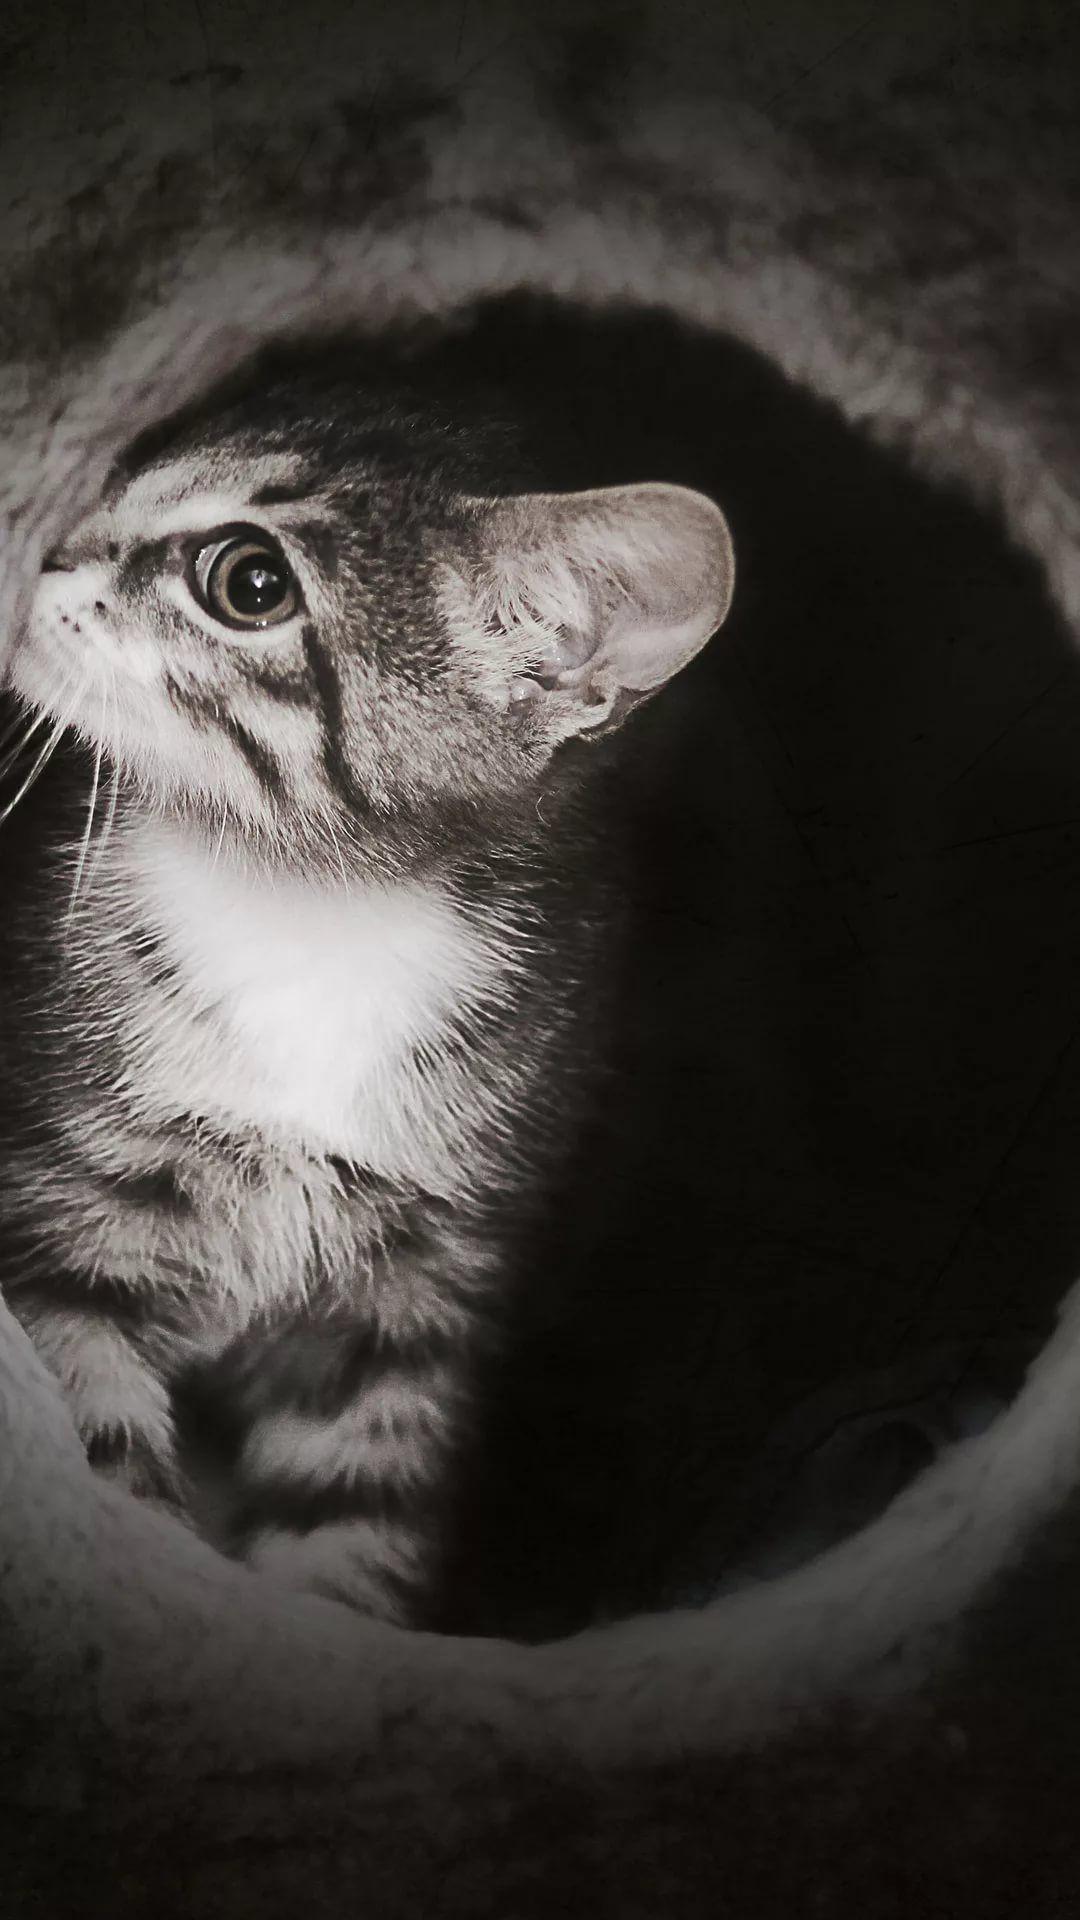 Beautiful Cat HD wallpaper for iPhone 6 1080p